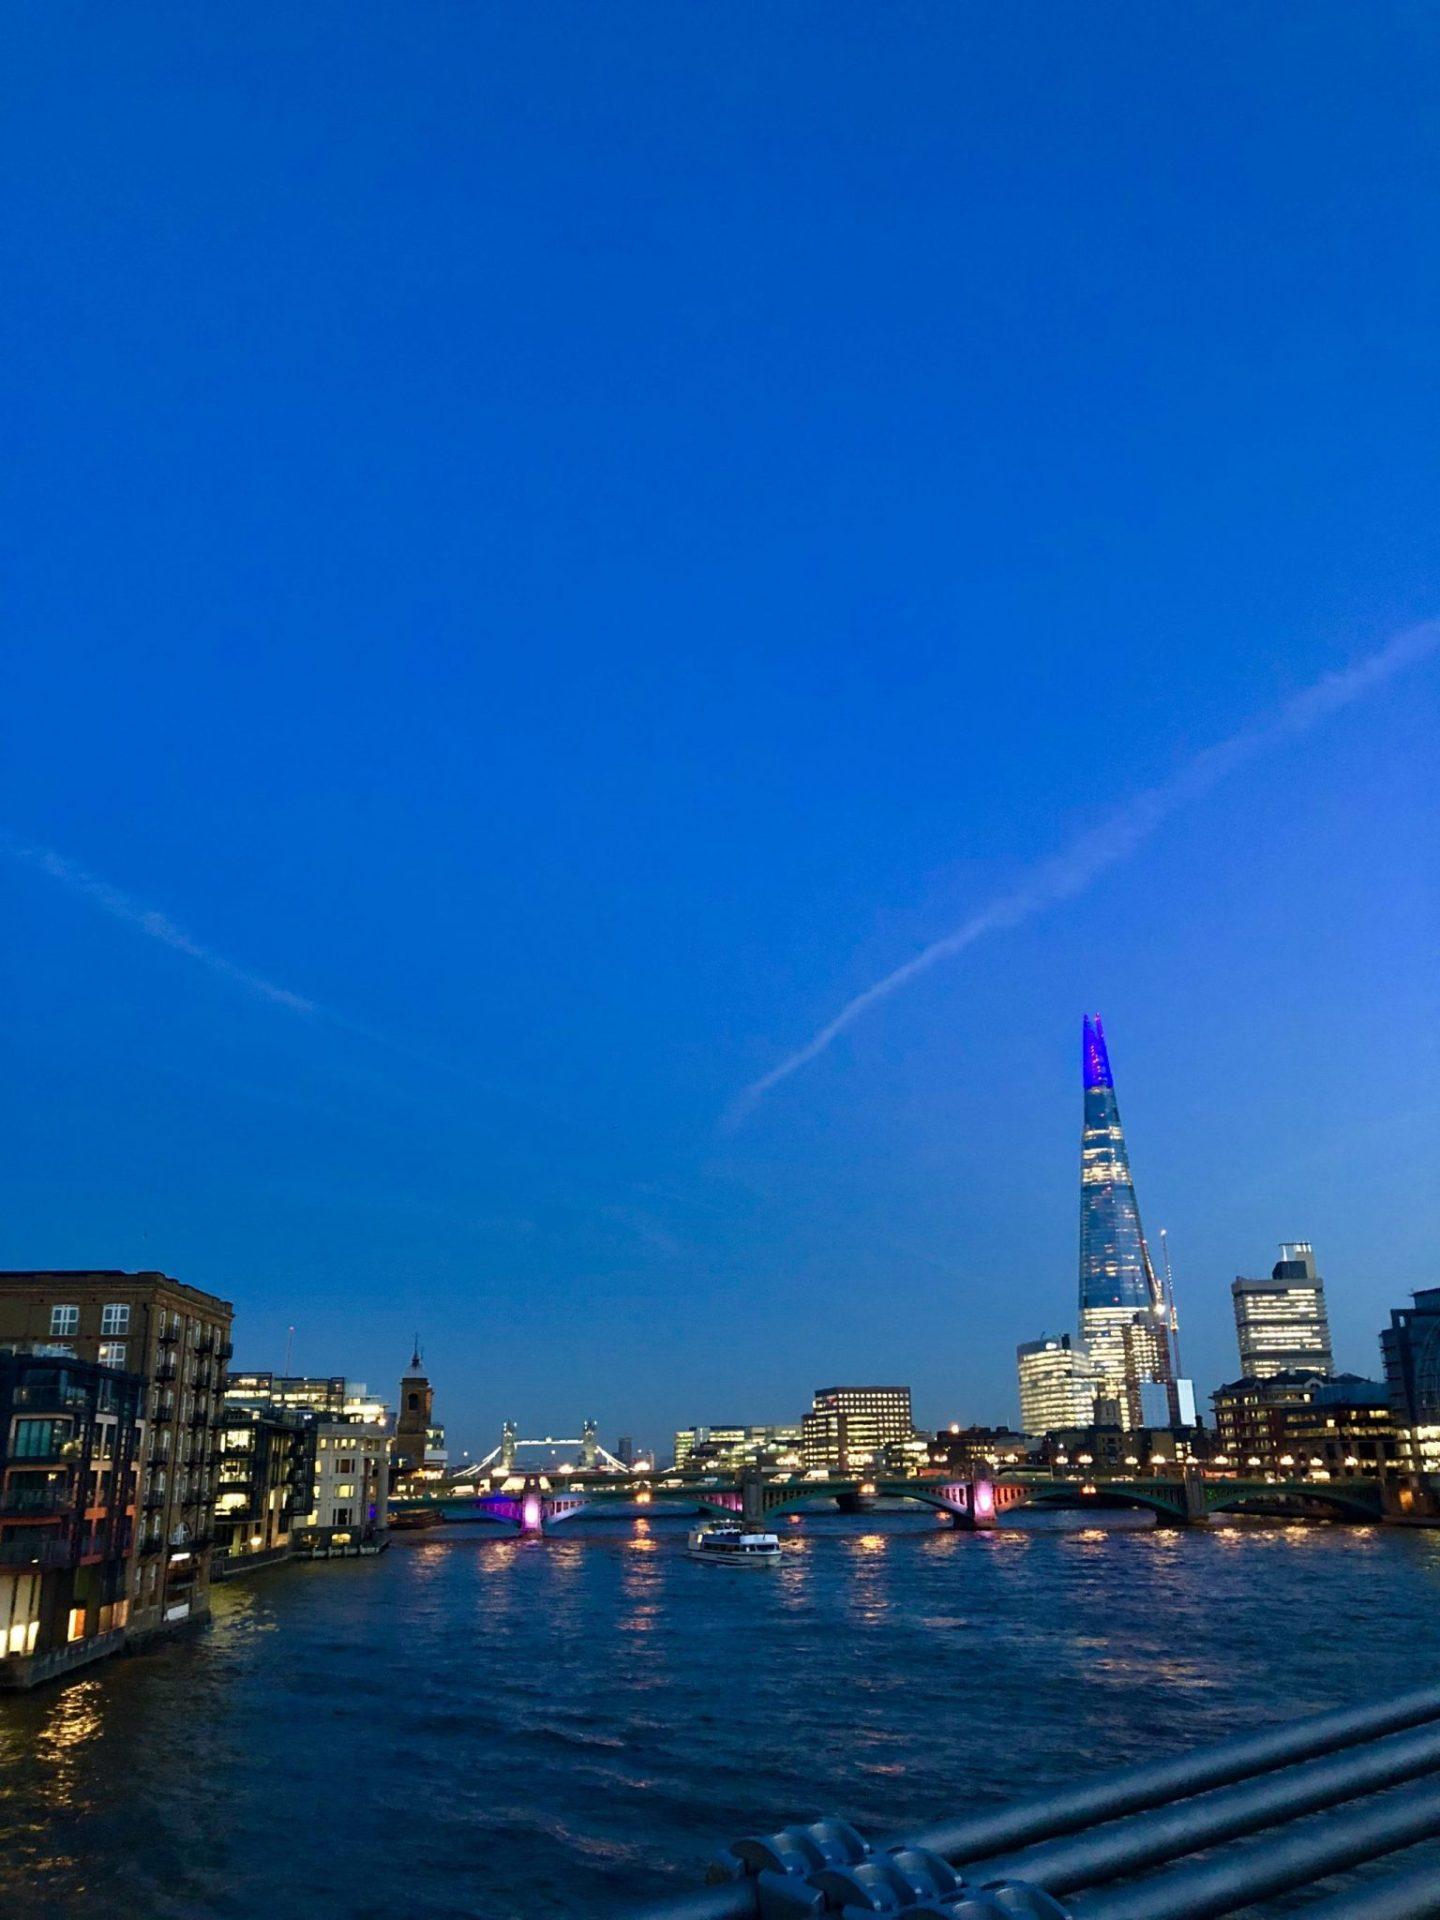 London skyline at night, including the Shard